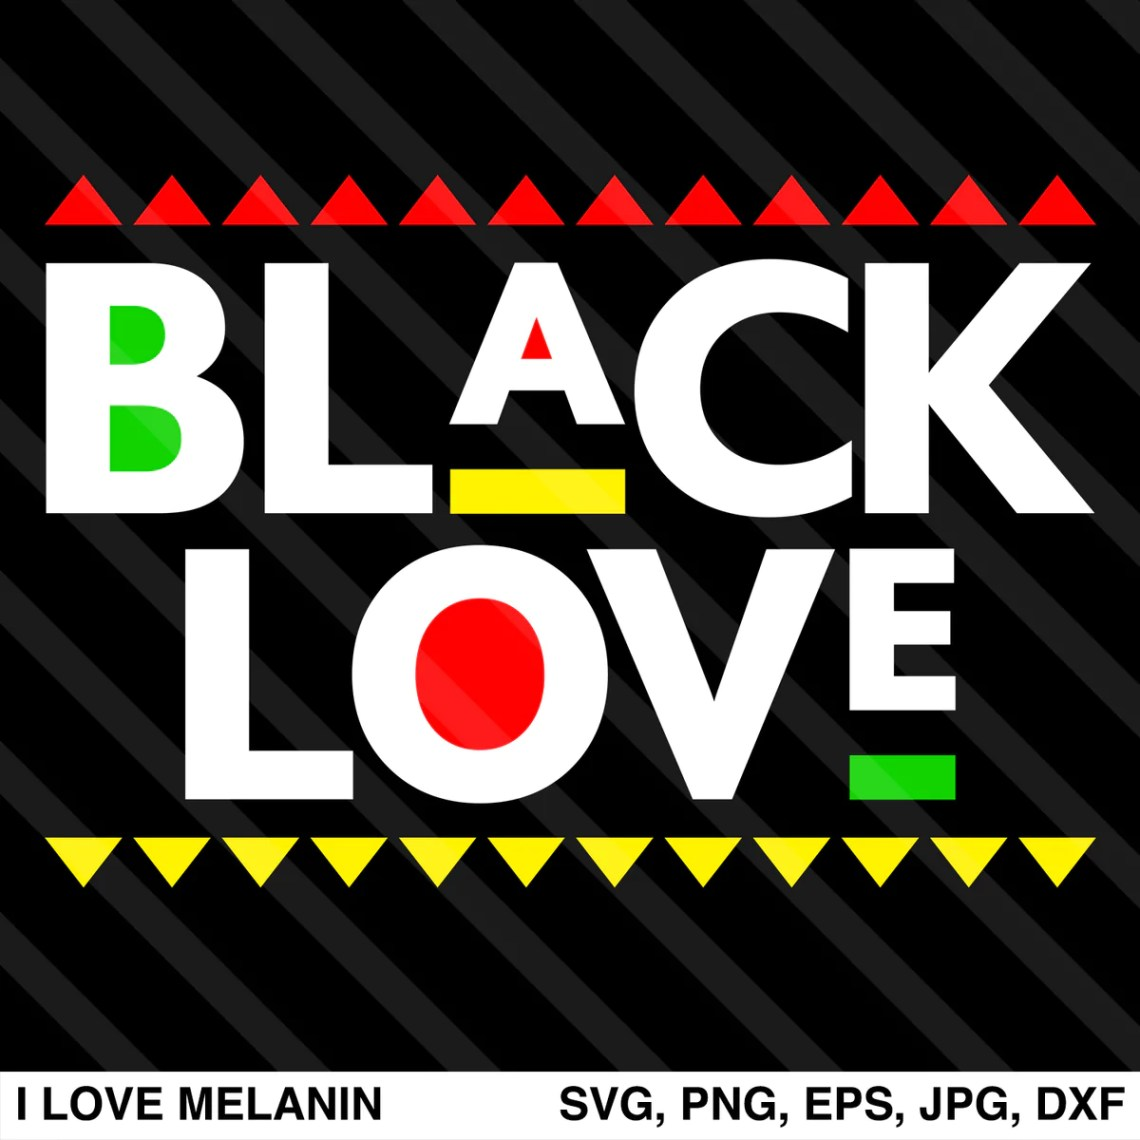 Download Black Love SVG - I Love Melanin